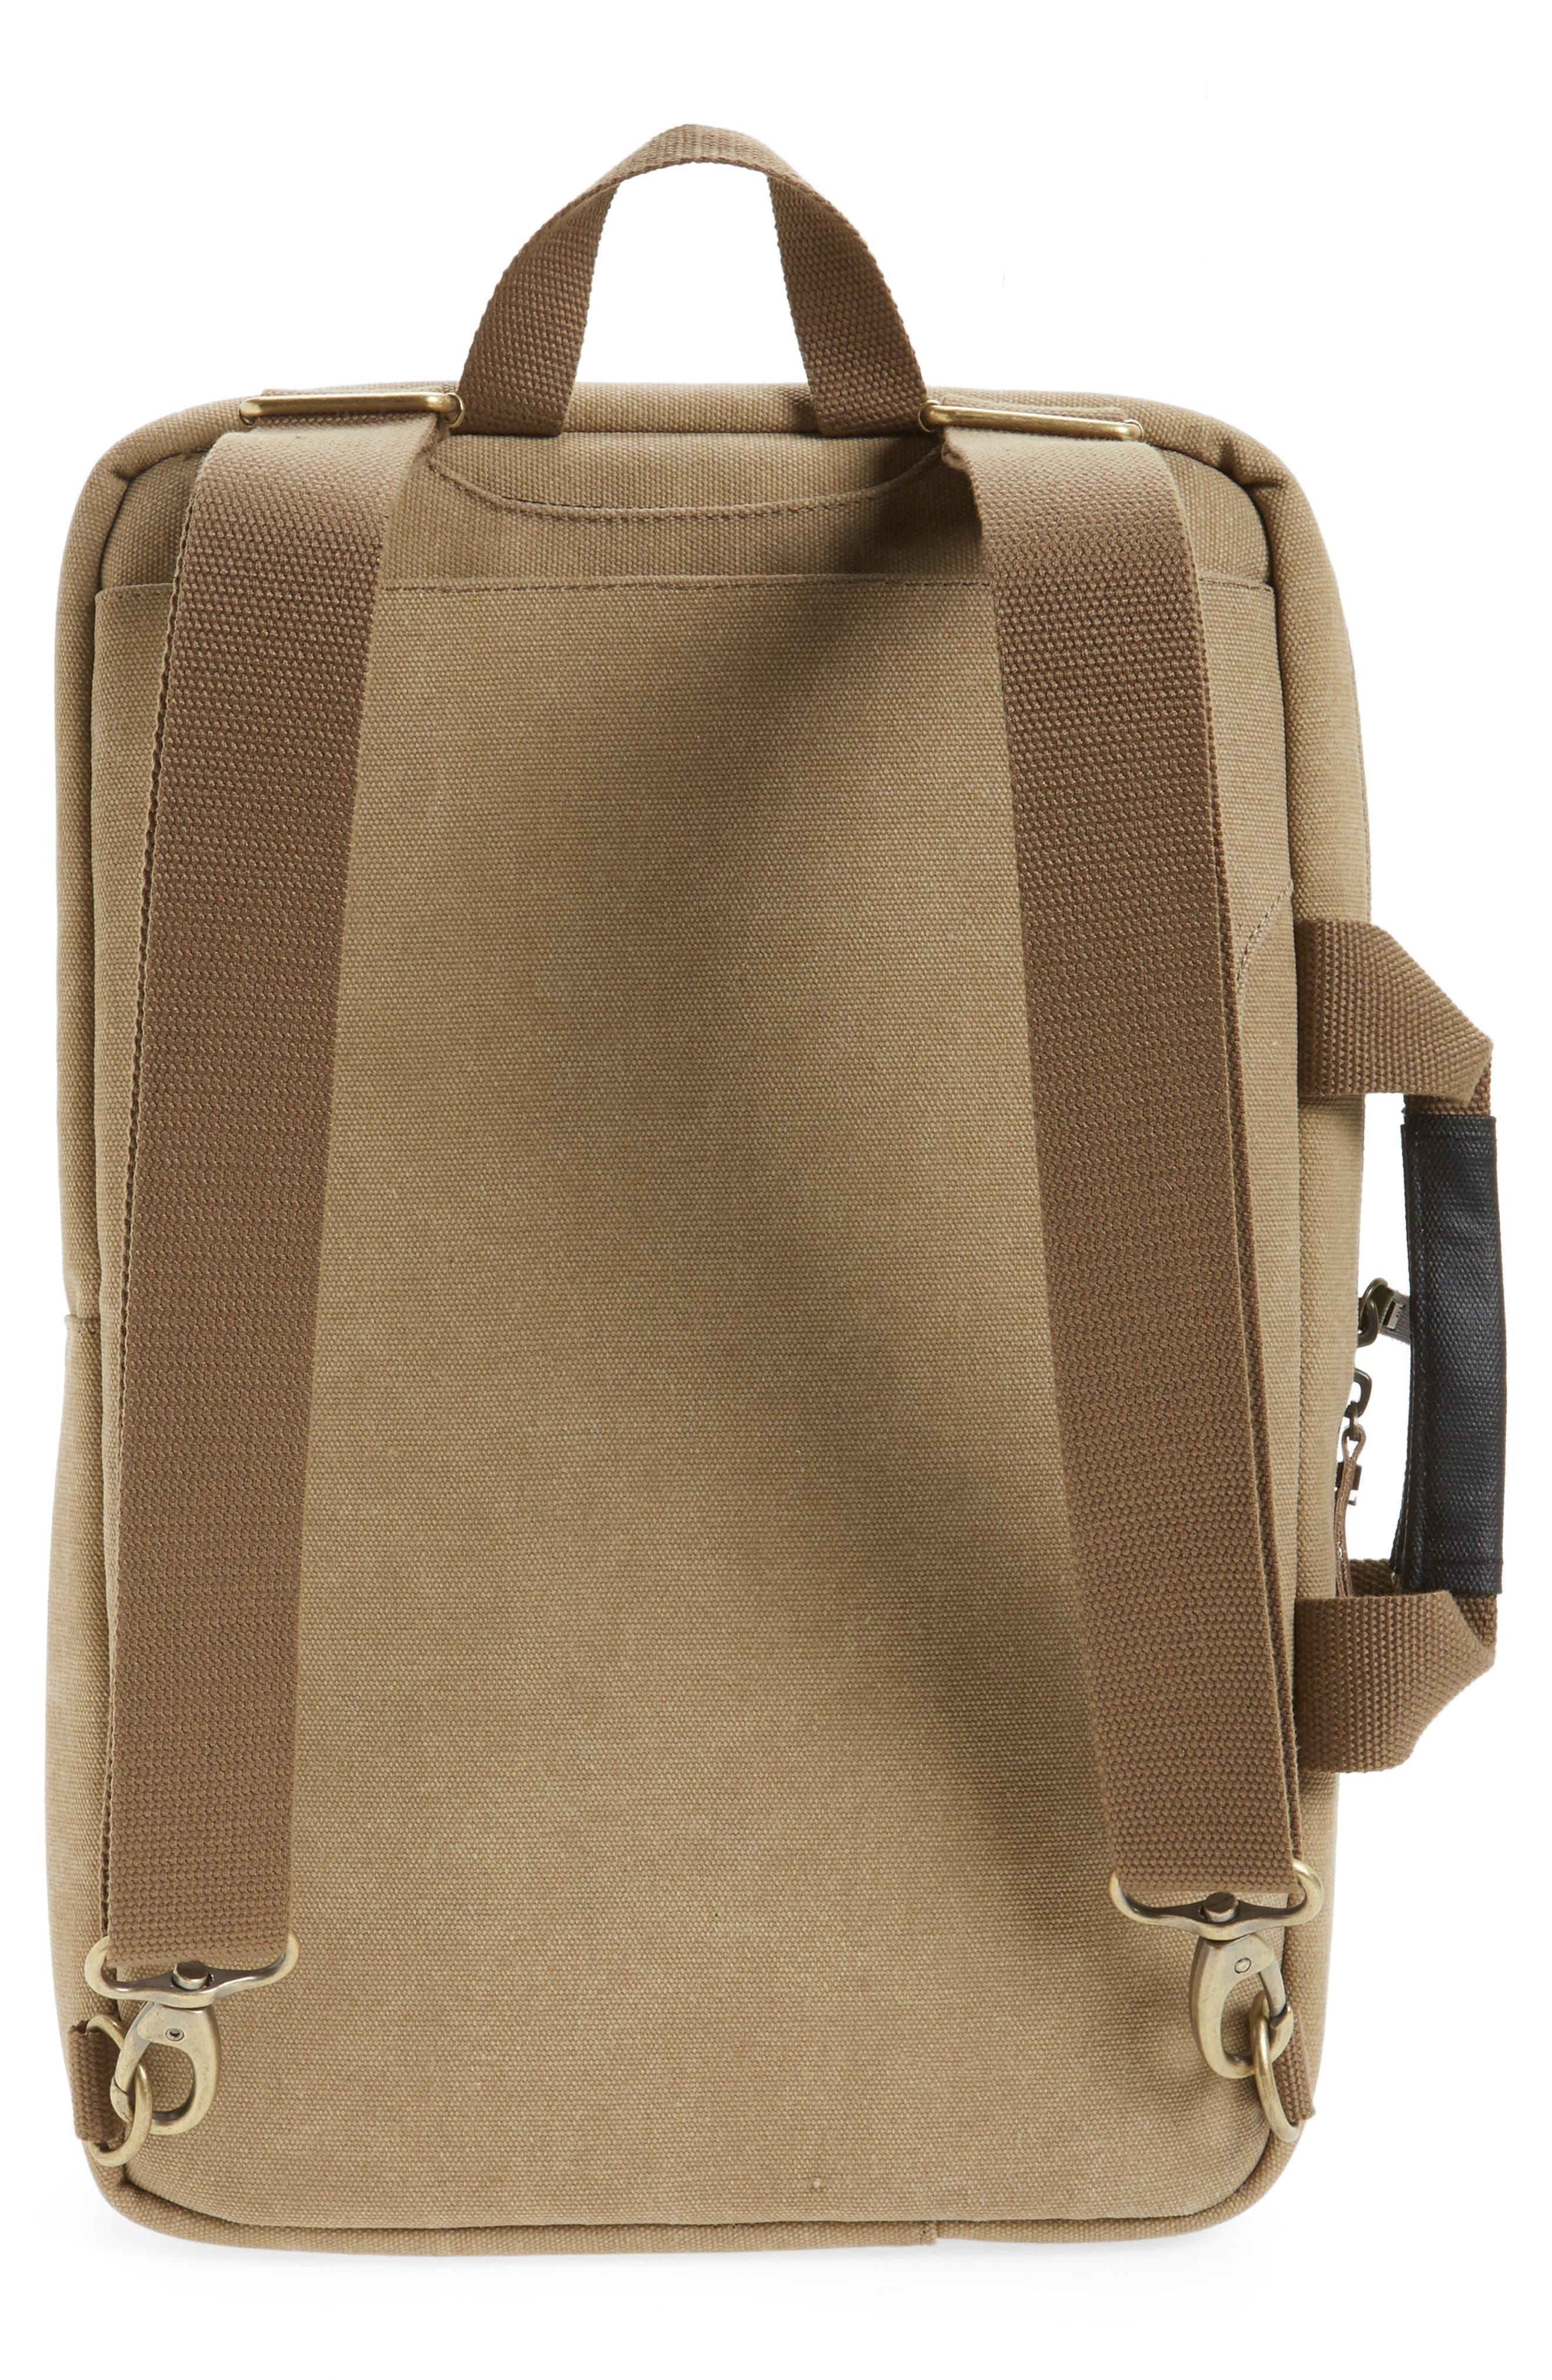 Radar Convertible Water Resistant Briefcase,                             Alternate thumbnail 16, color,